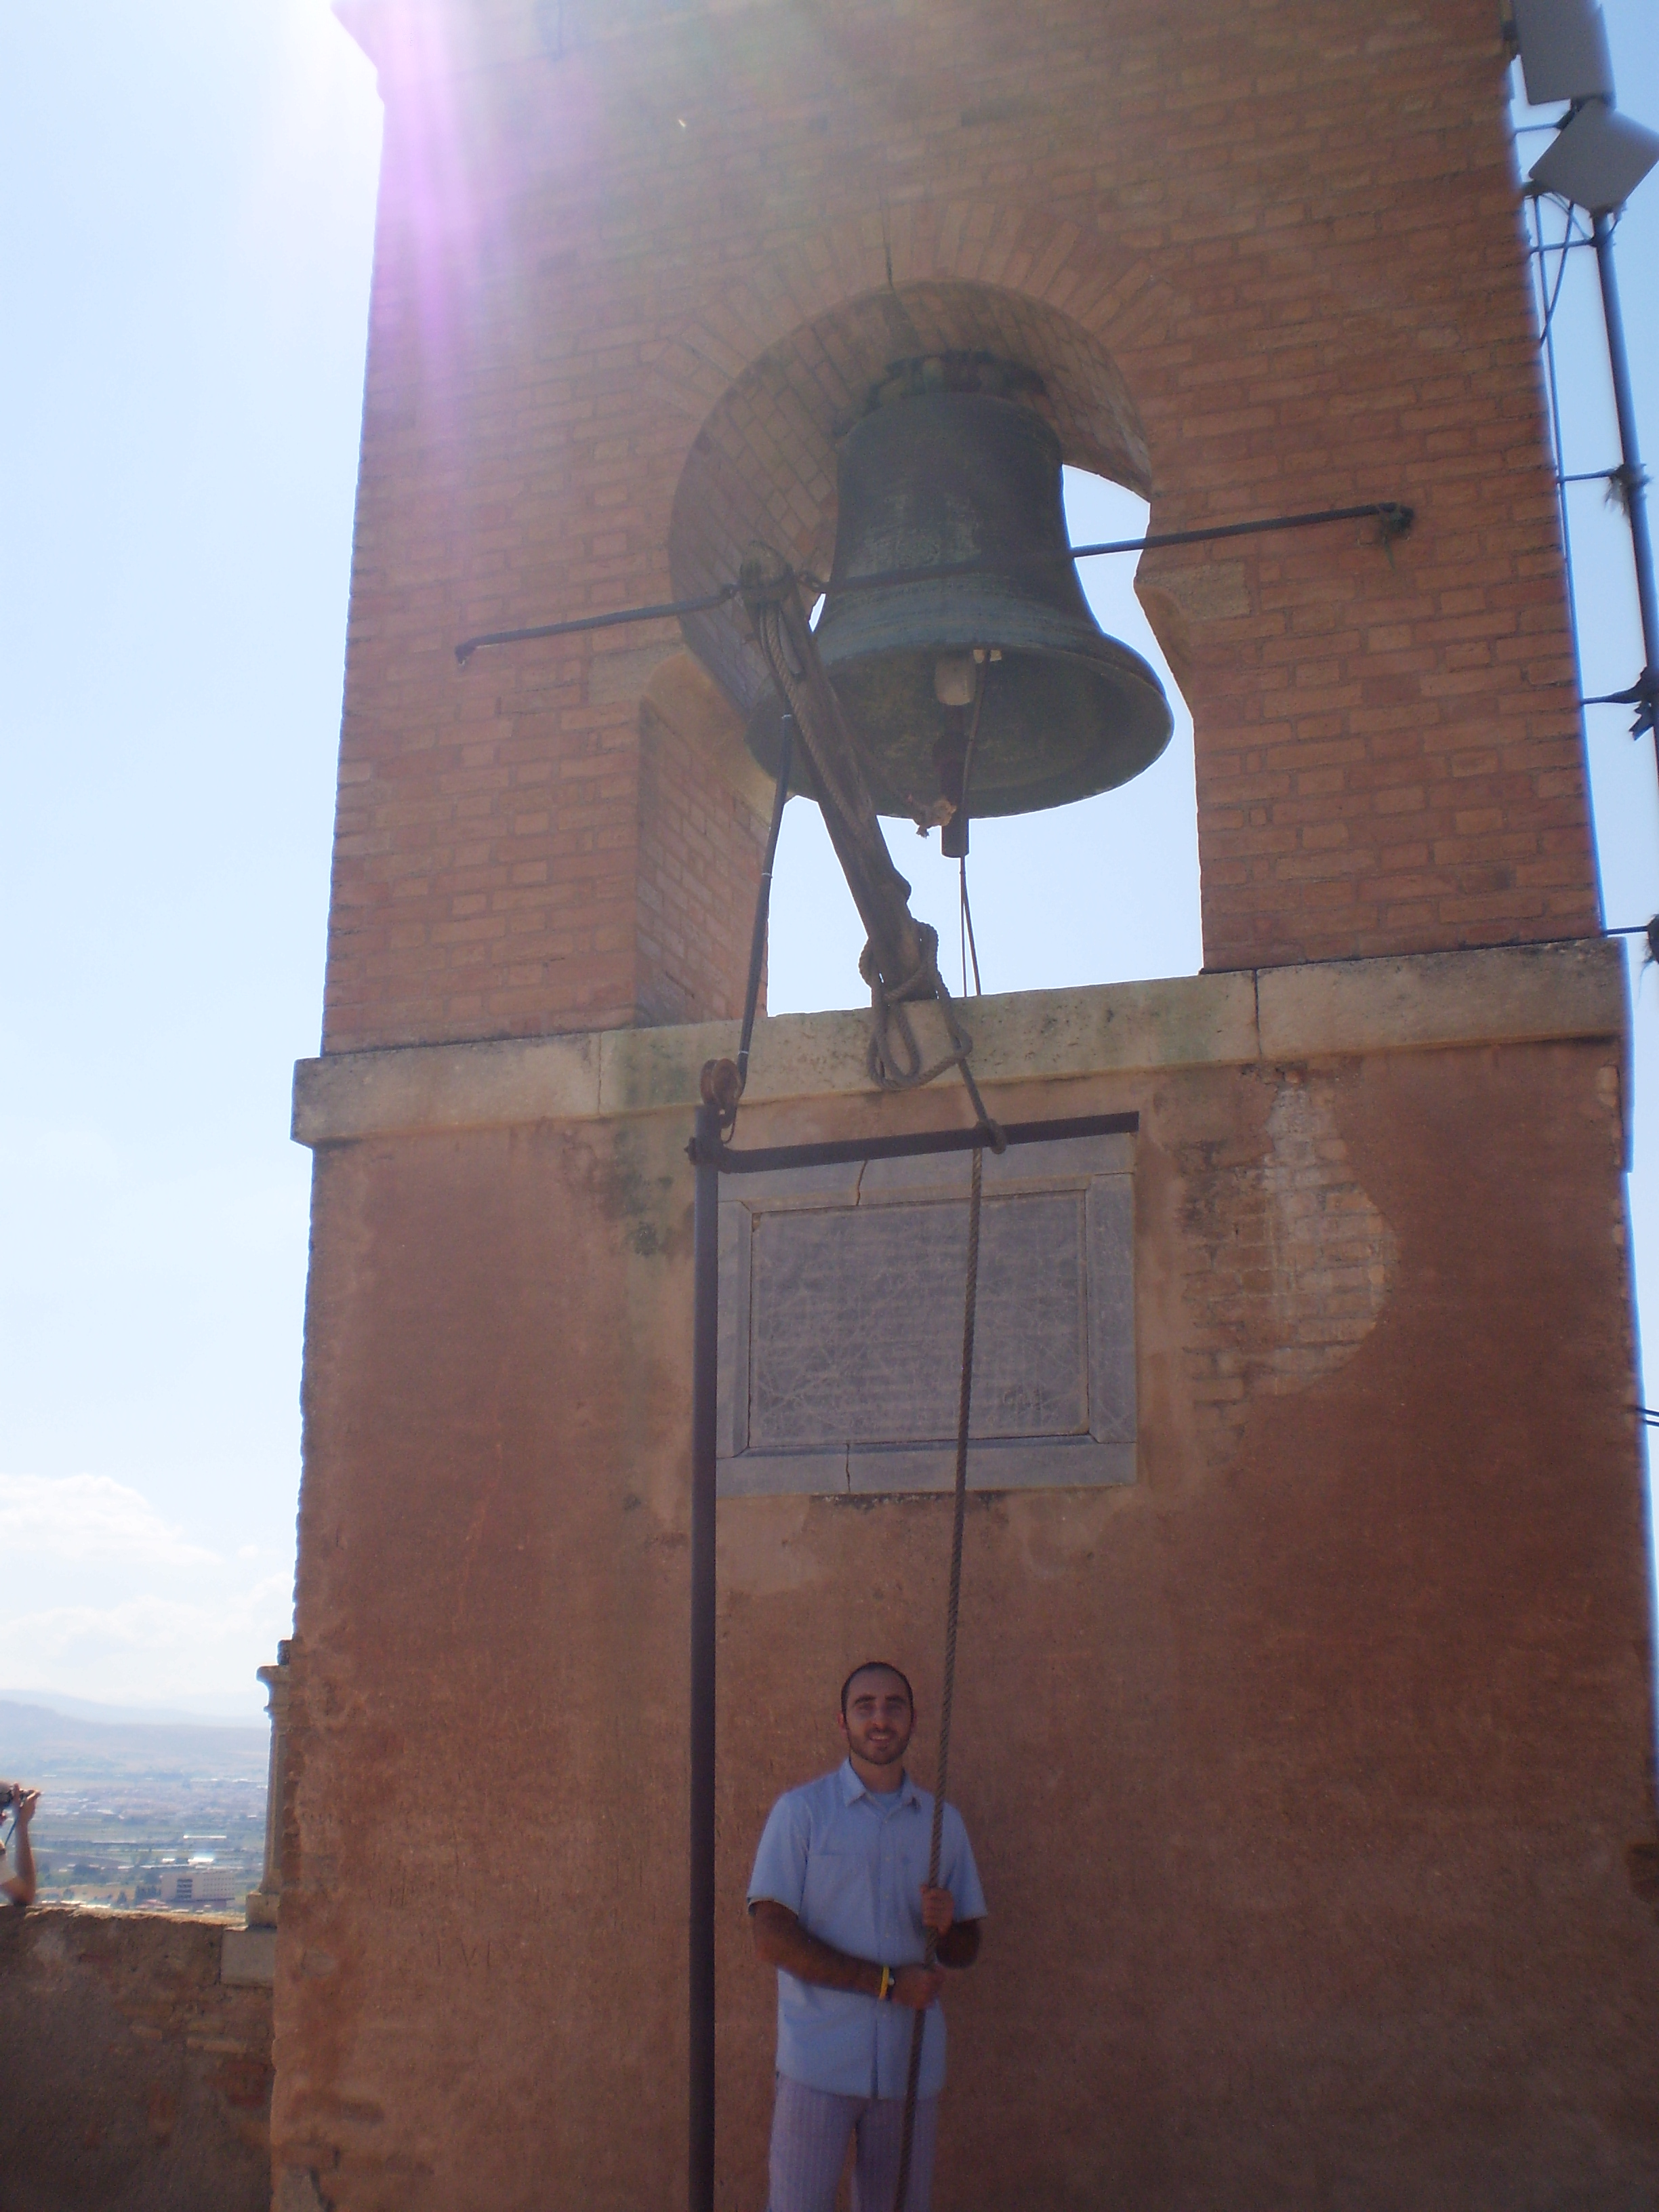 Campana de la Torre de la Vela